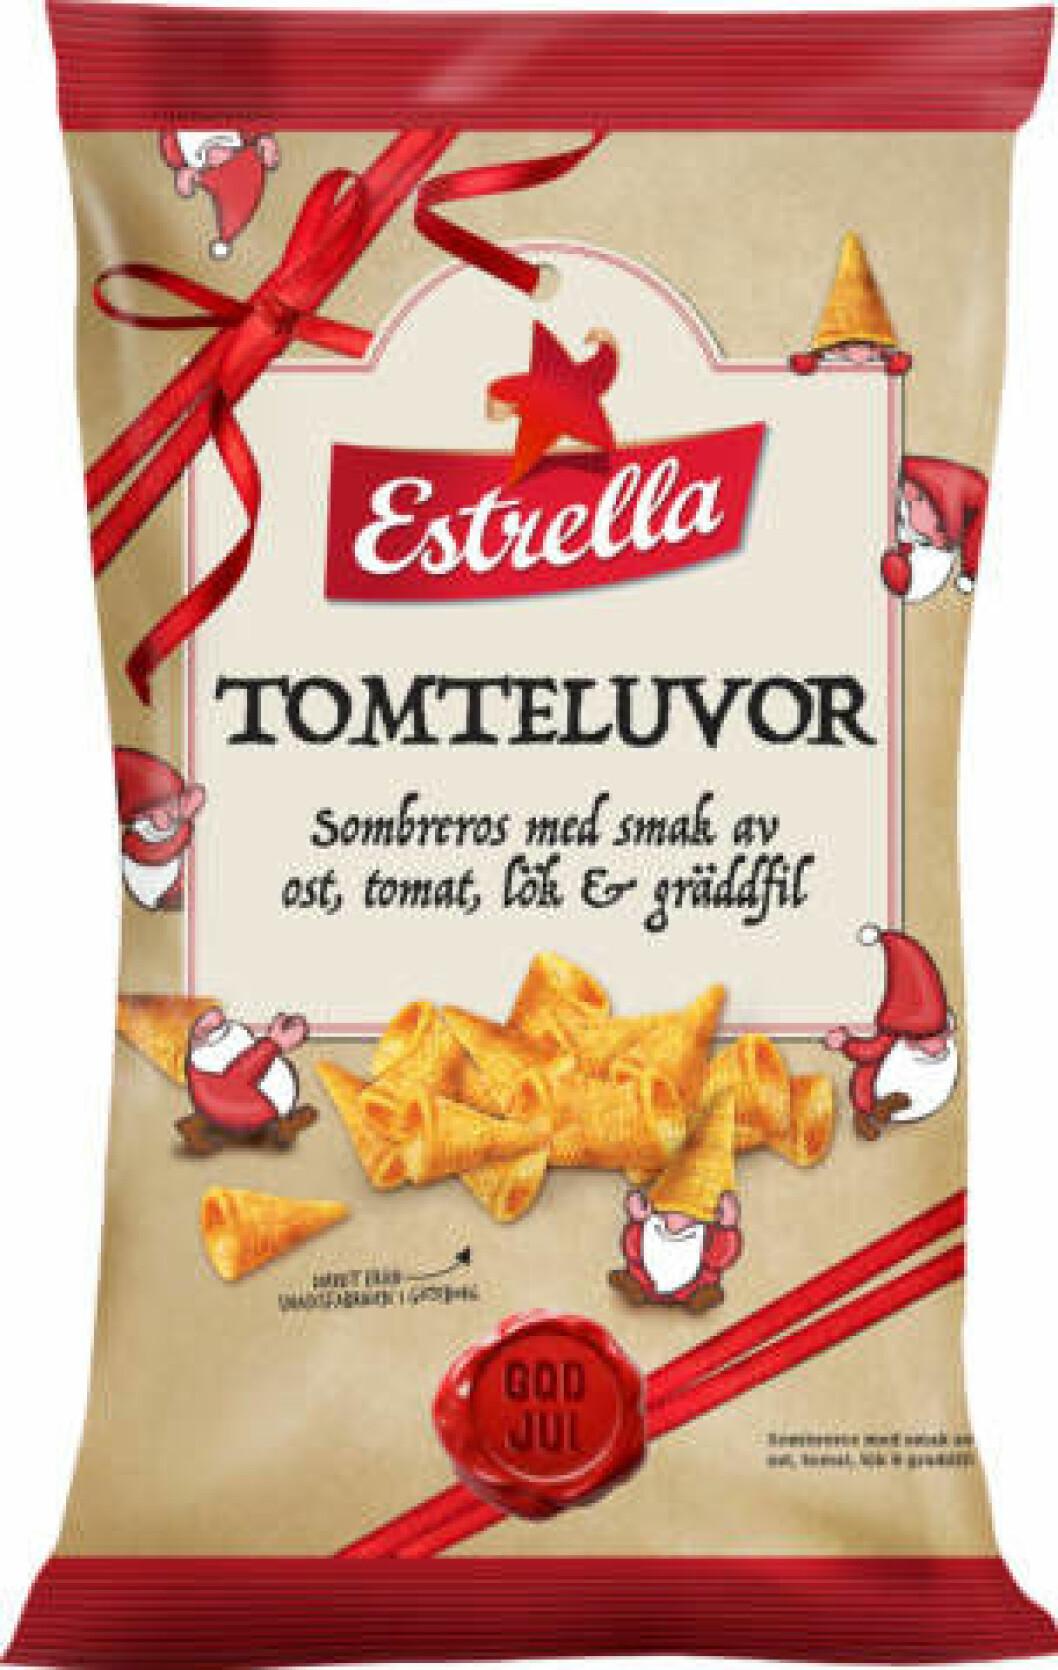 Tomteluvor snacks.